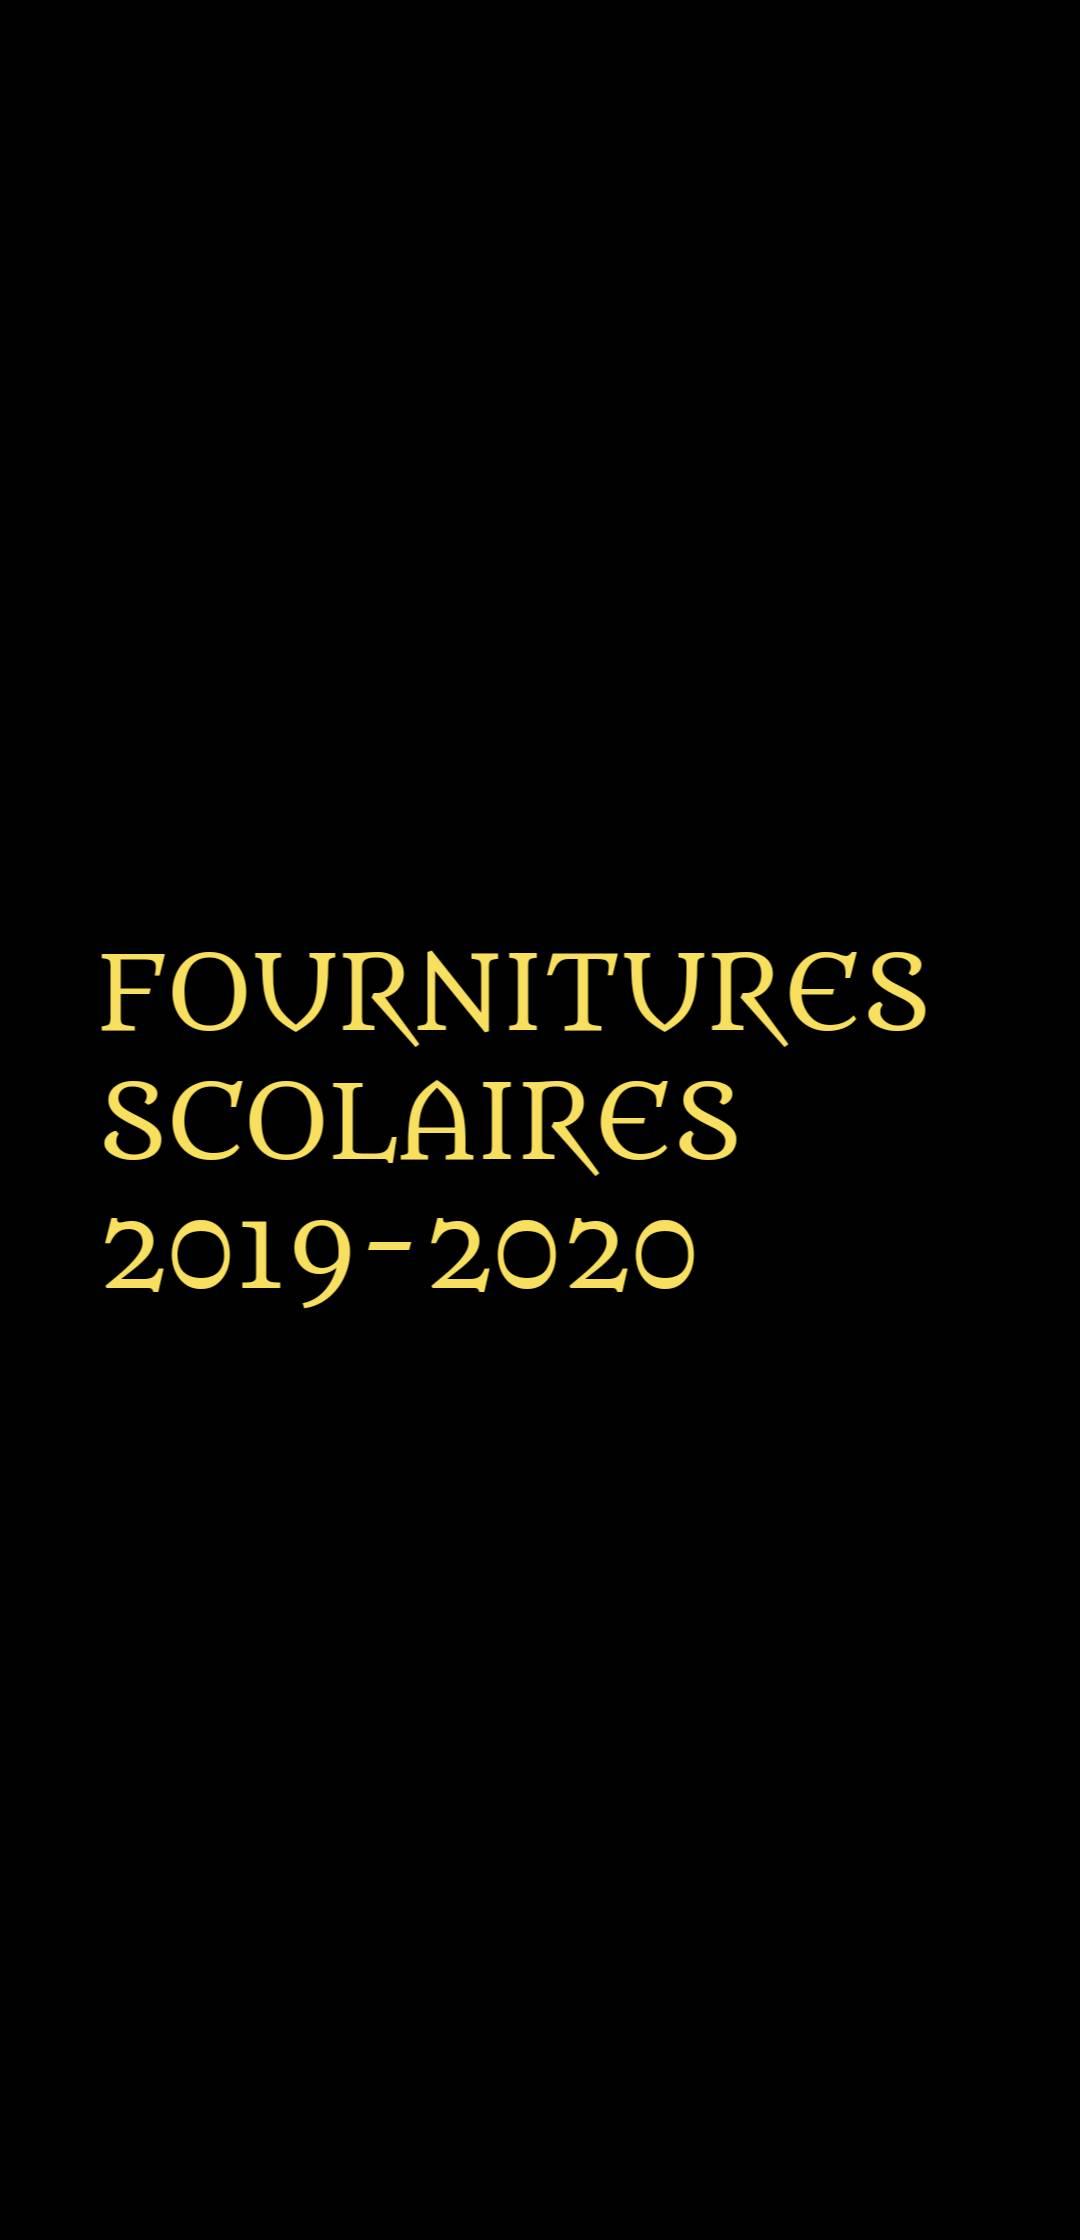 FOURNITURES RENTREE 2019